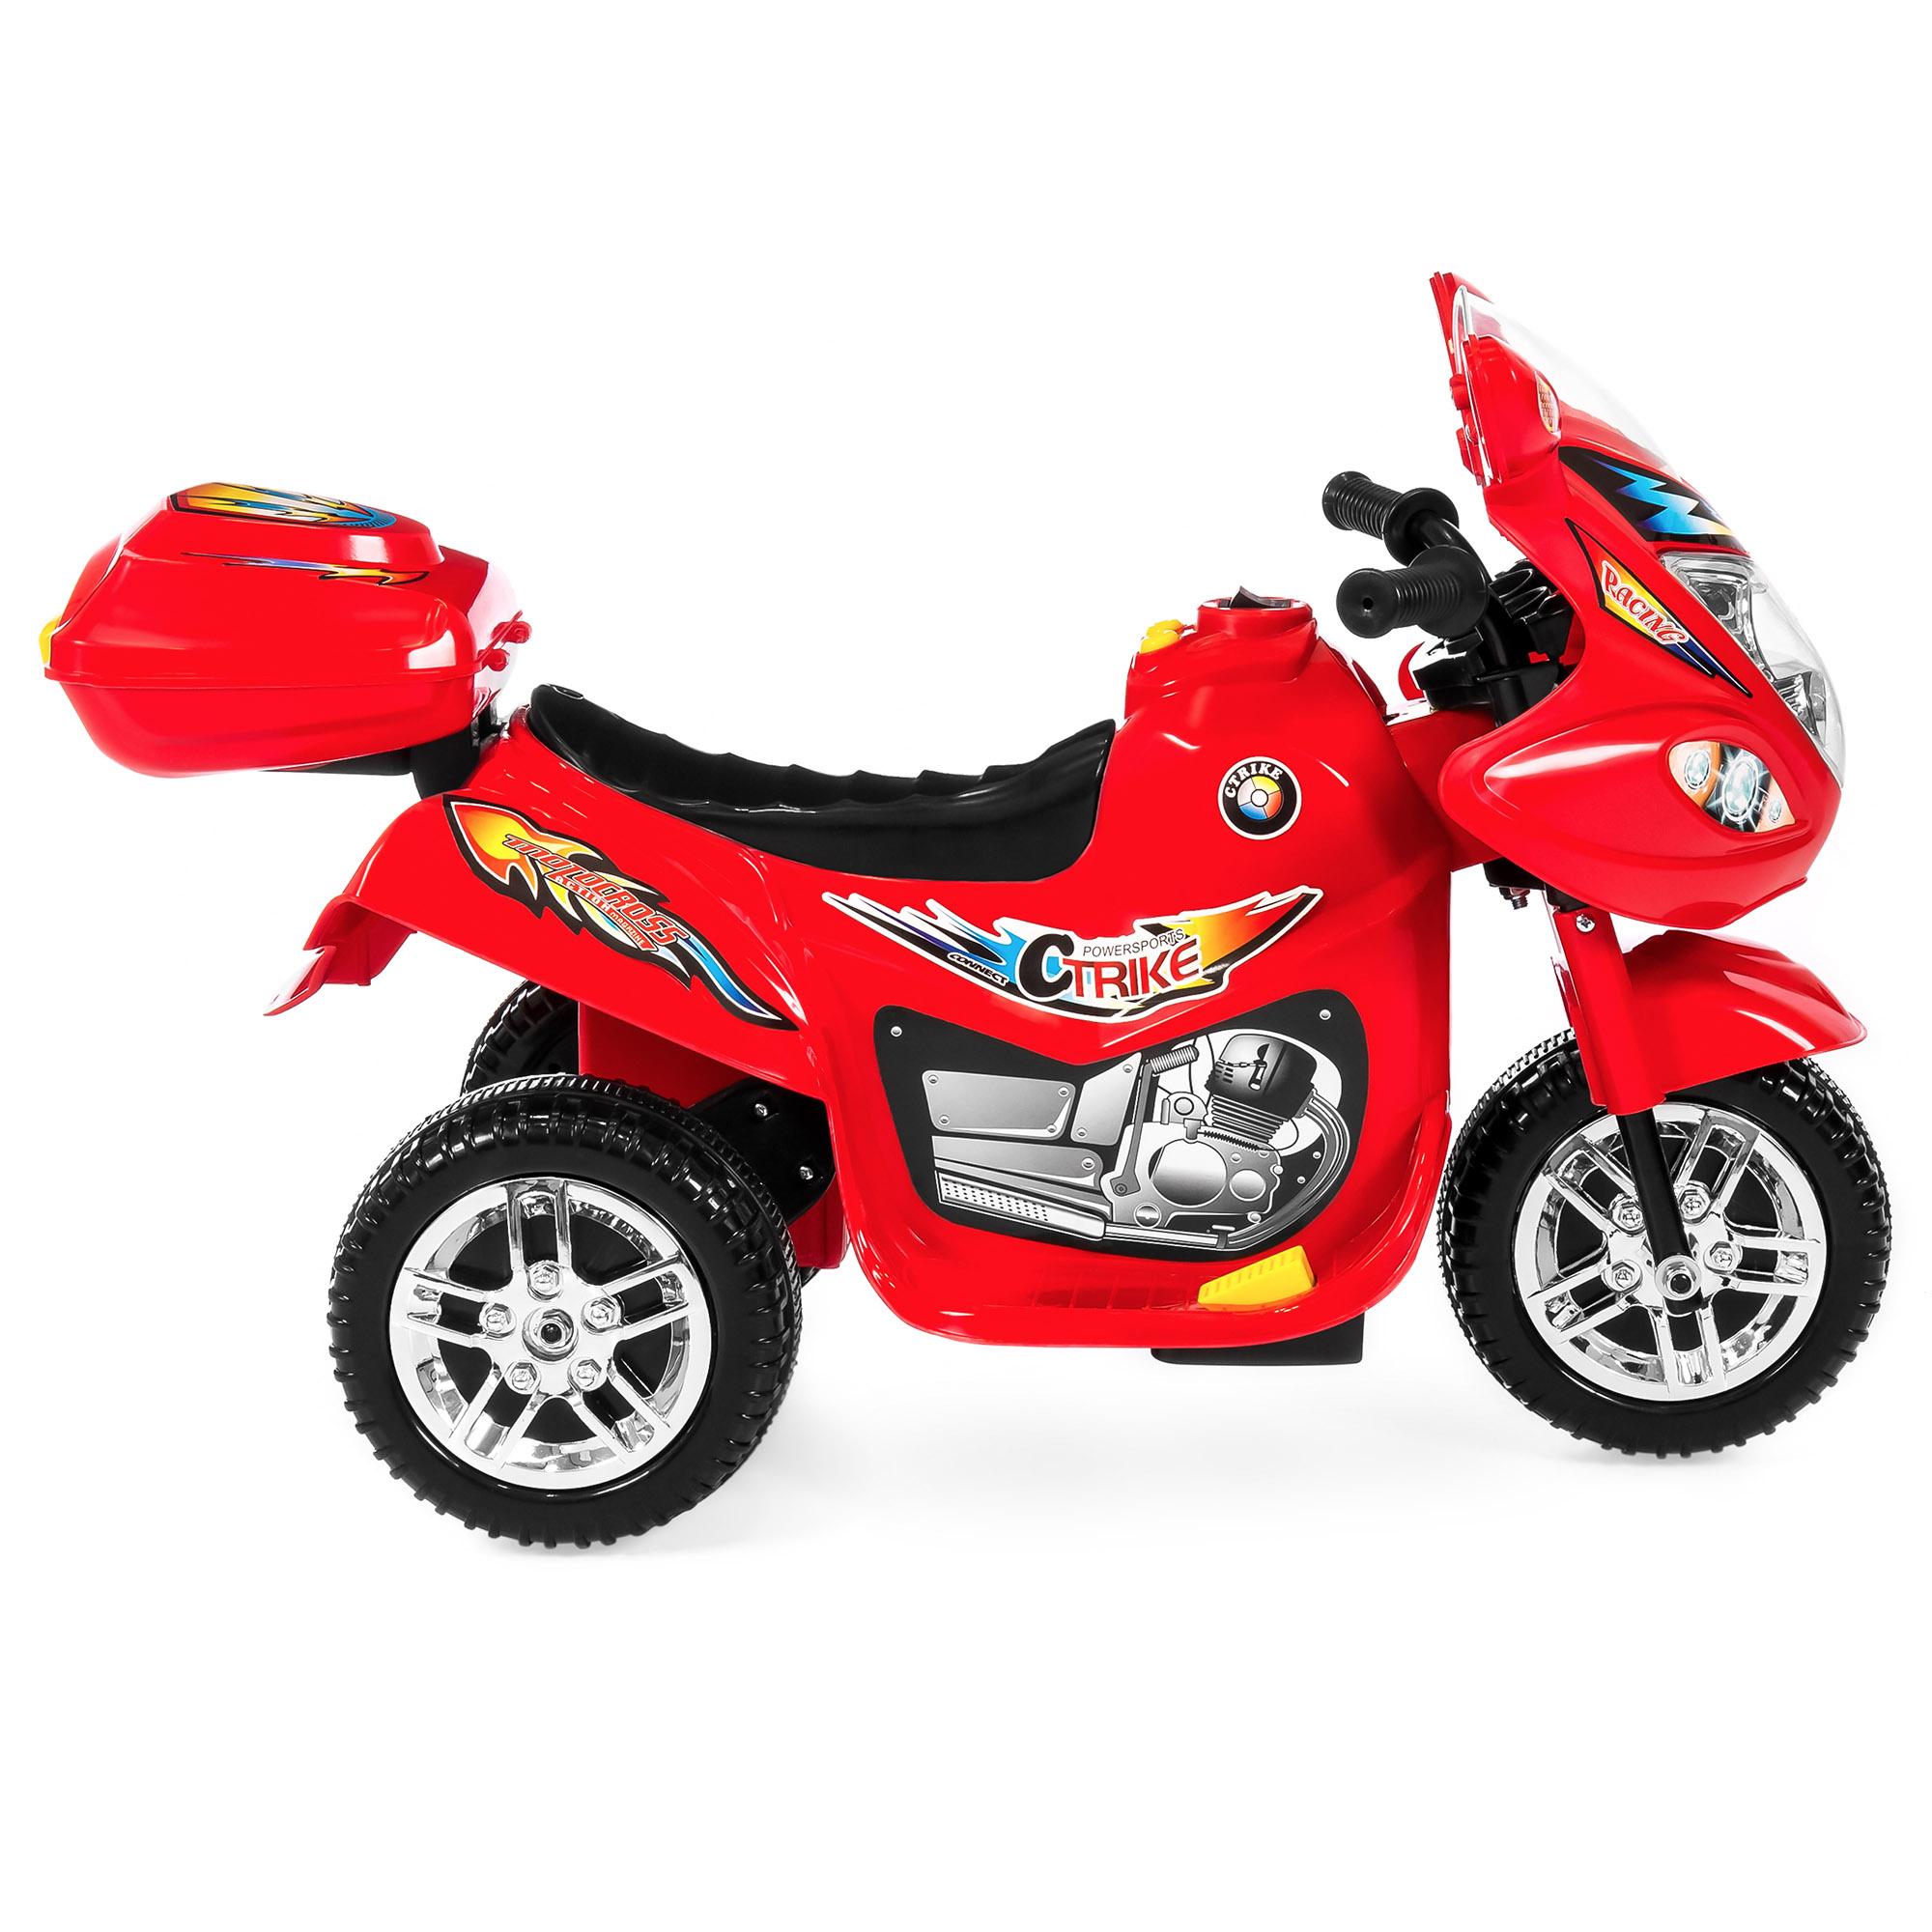 BCP-6V-Kids-3-Wheel-Motorcycle-Ride-On-Toy-w-LED-Lights-Music-Storage thumbnail 32